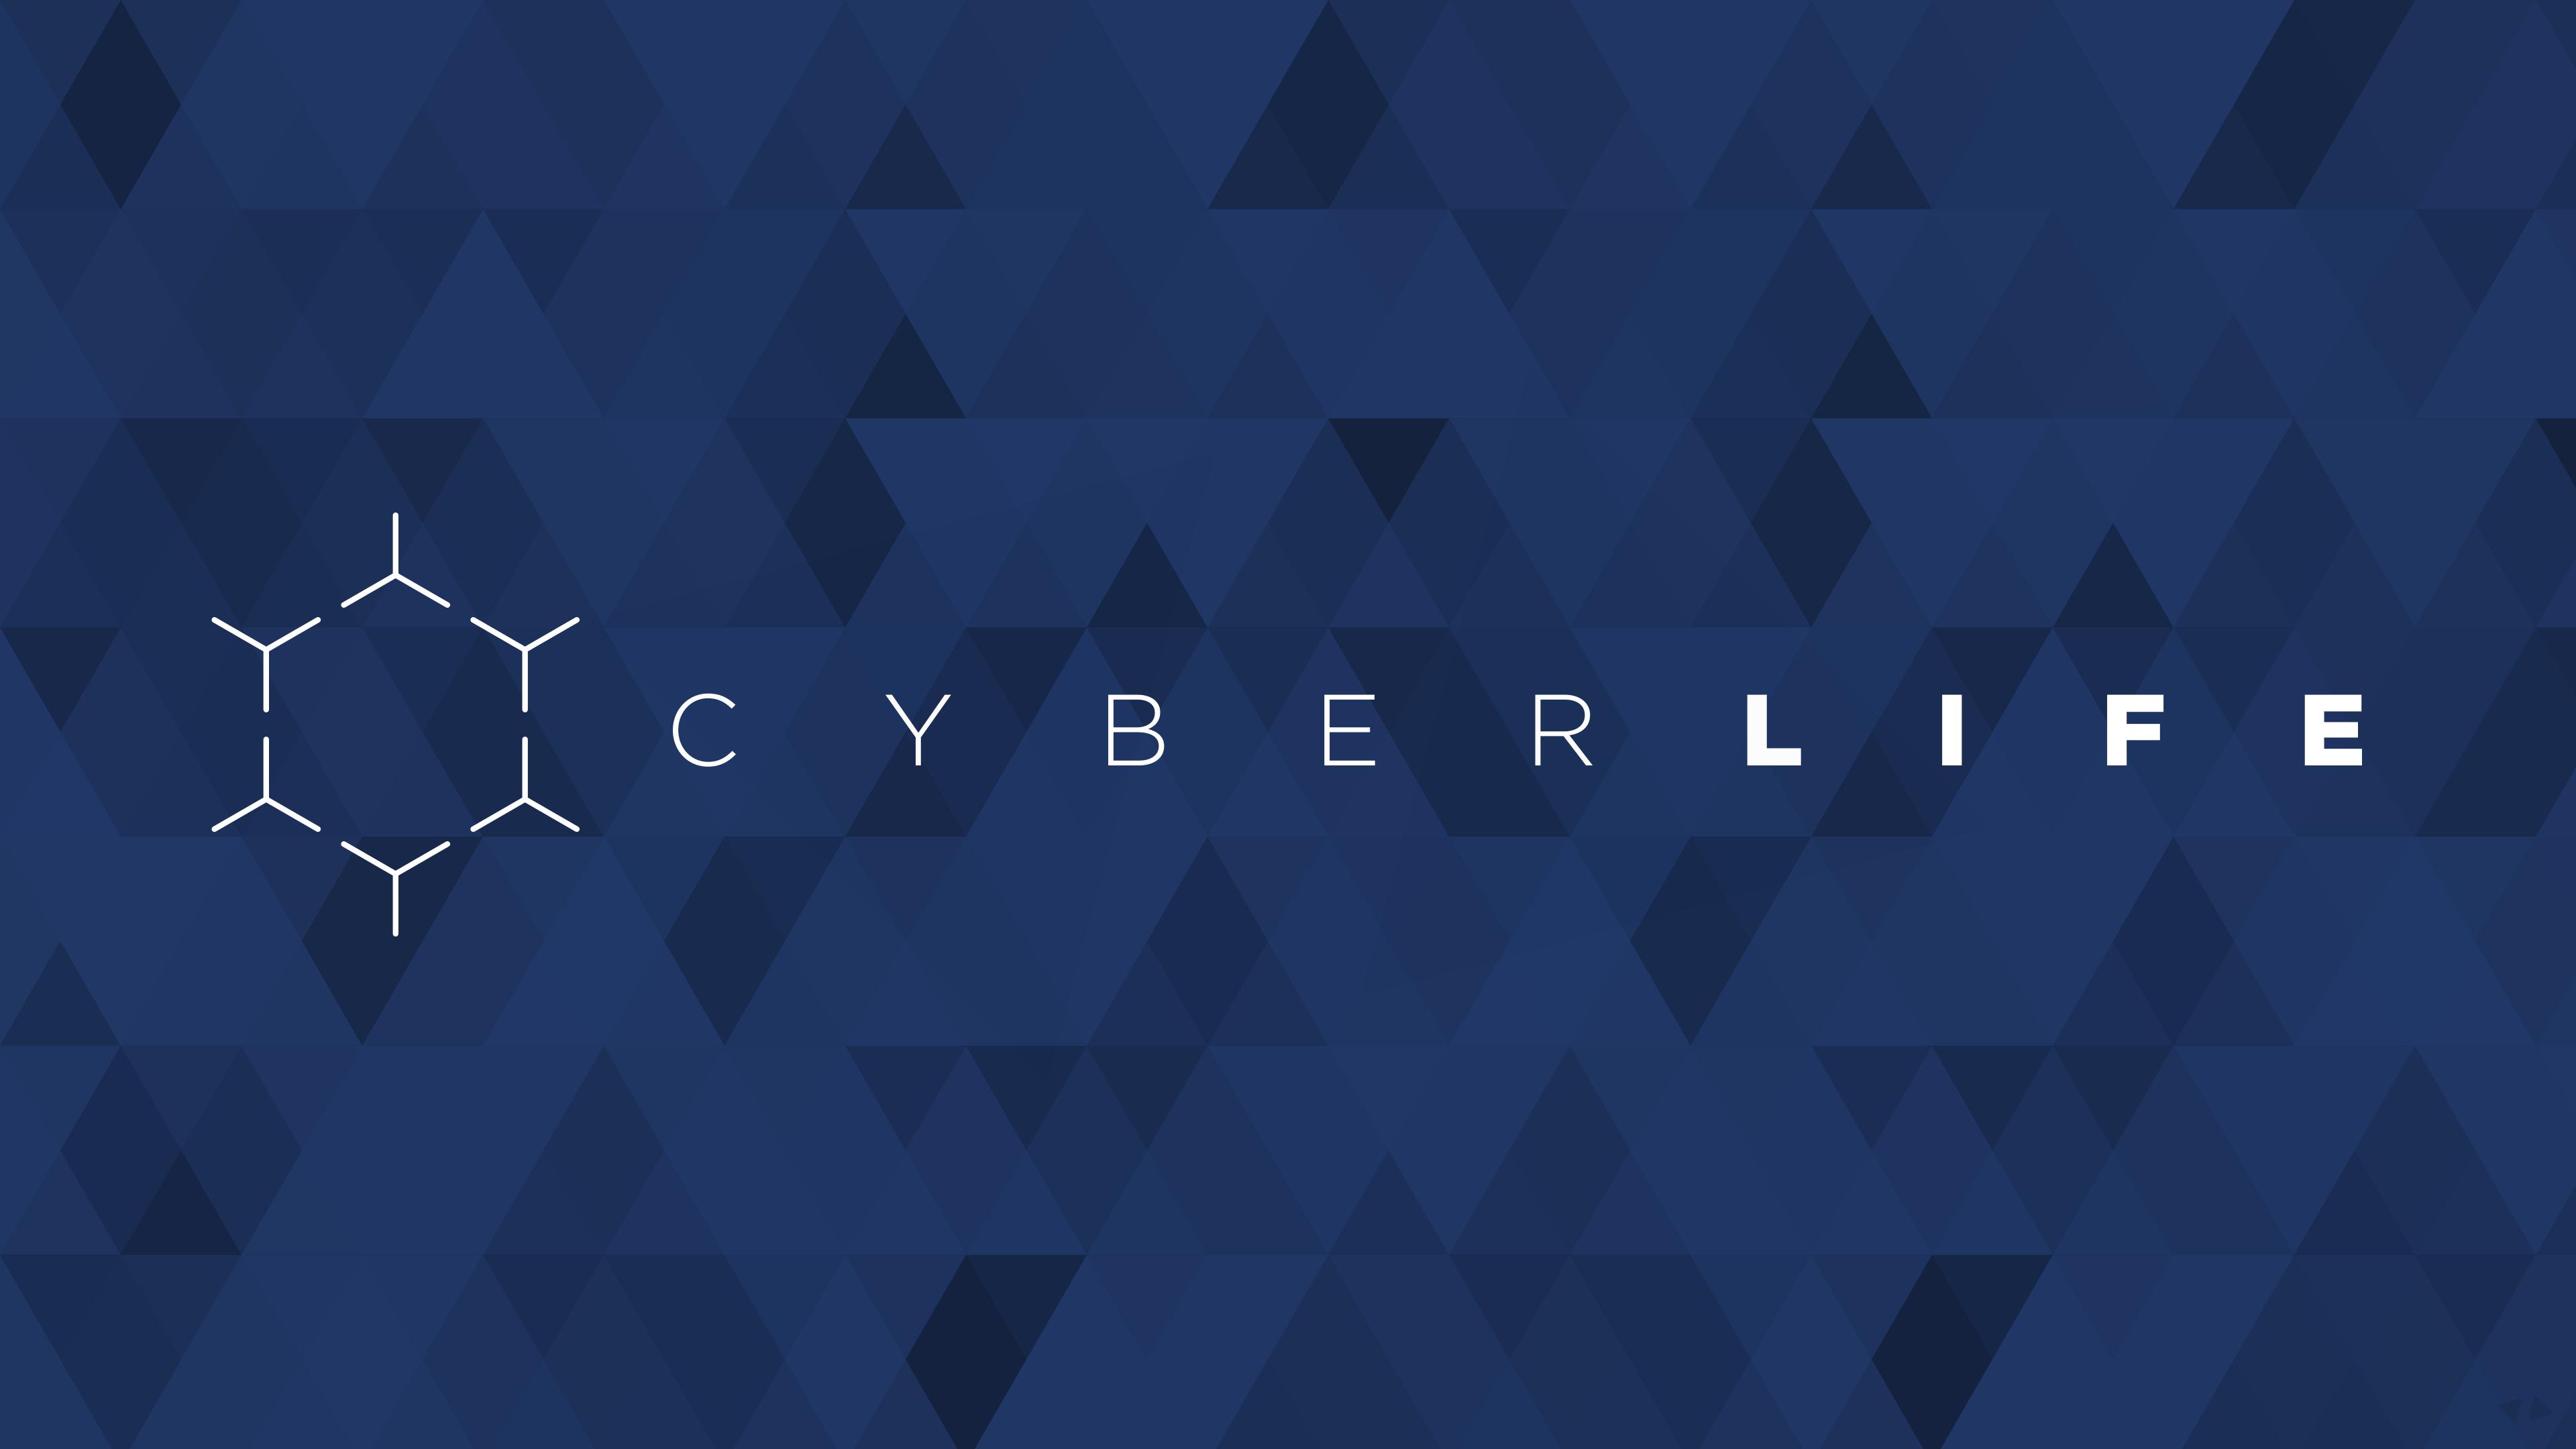 Wallpaper Cyberlife Logo Text Geometry Triangle Detroit